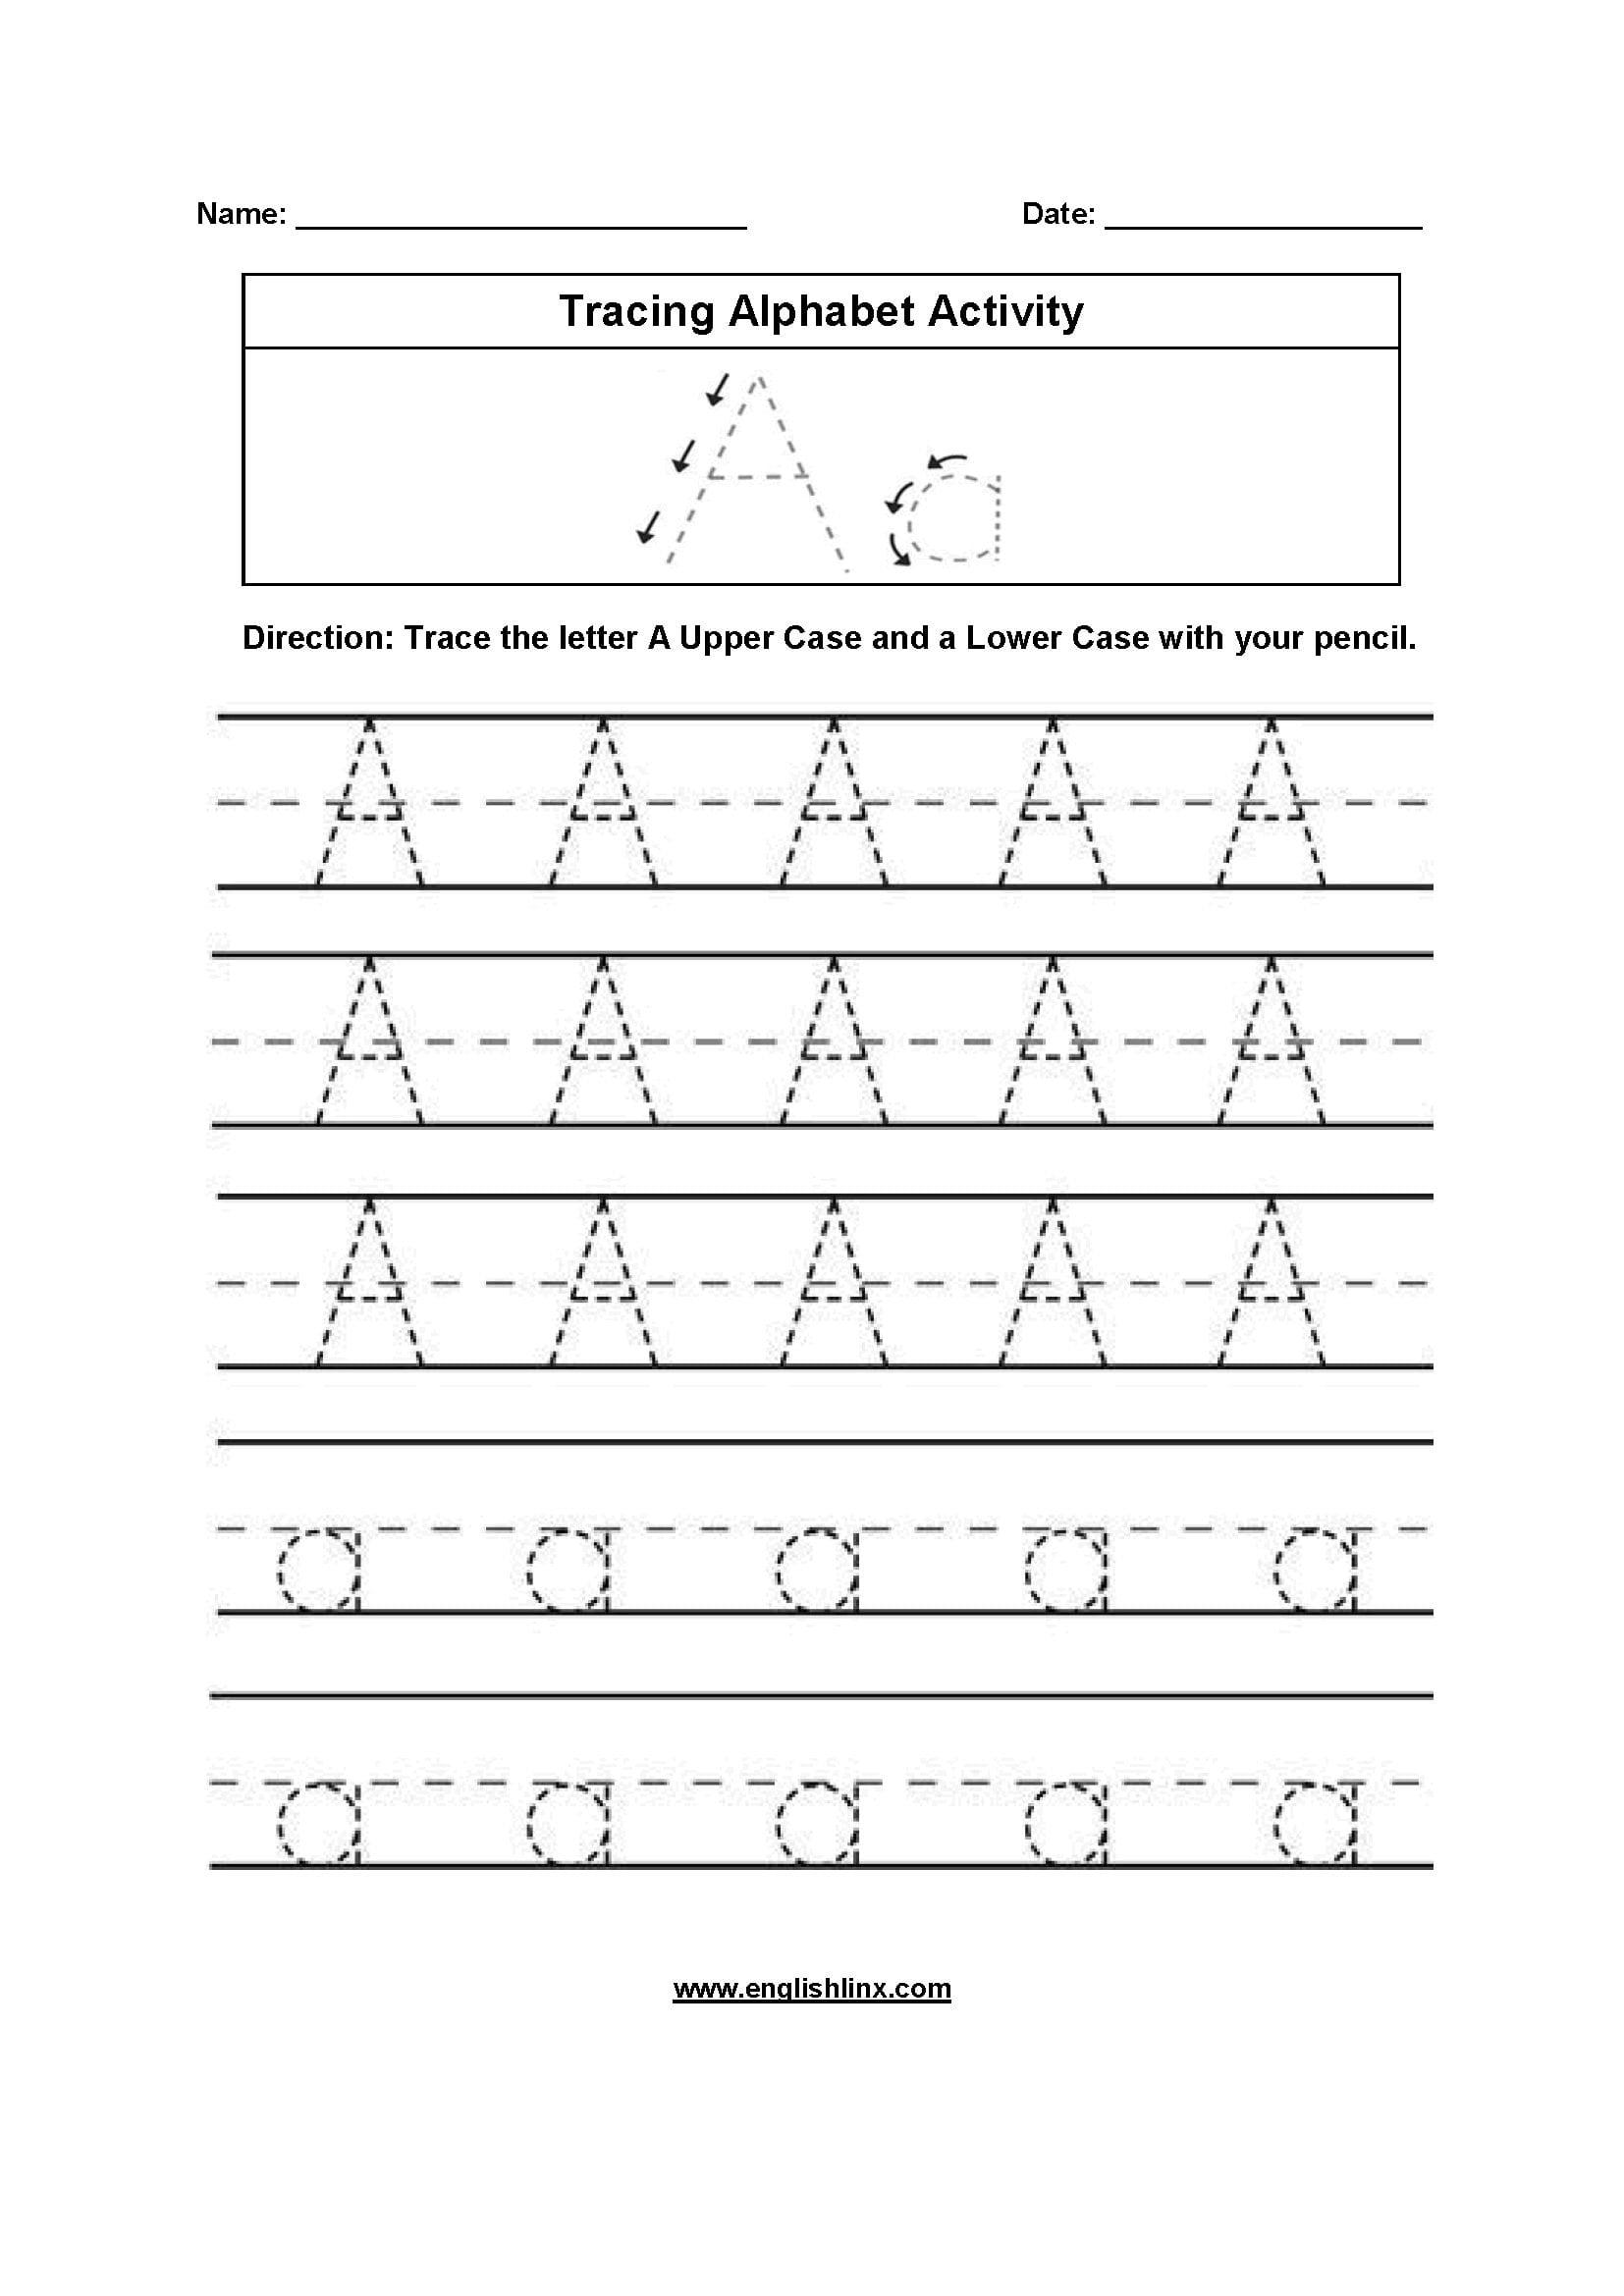 Alphabet Worksheets  Tracing Alphabet Worksheets With Letter Tracing Worksheets Pdf